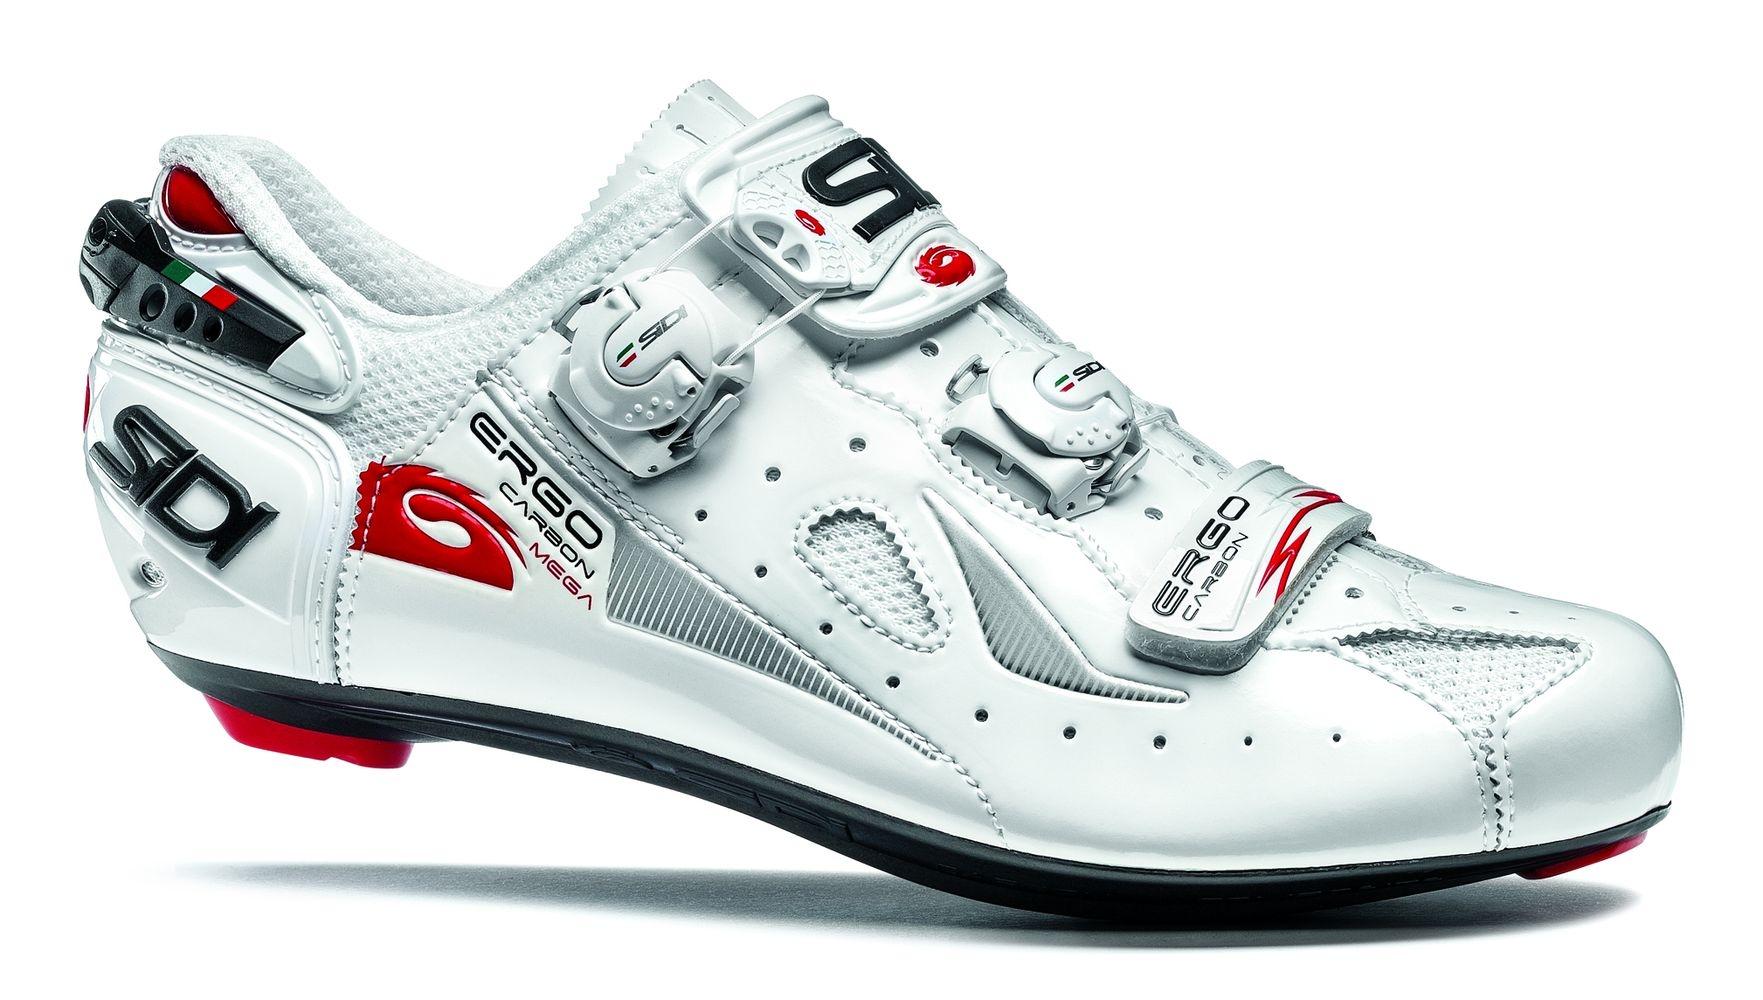 Chaussures Sidi ERGO 4 Mega Carbon Composite Blanc - 42